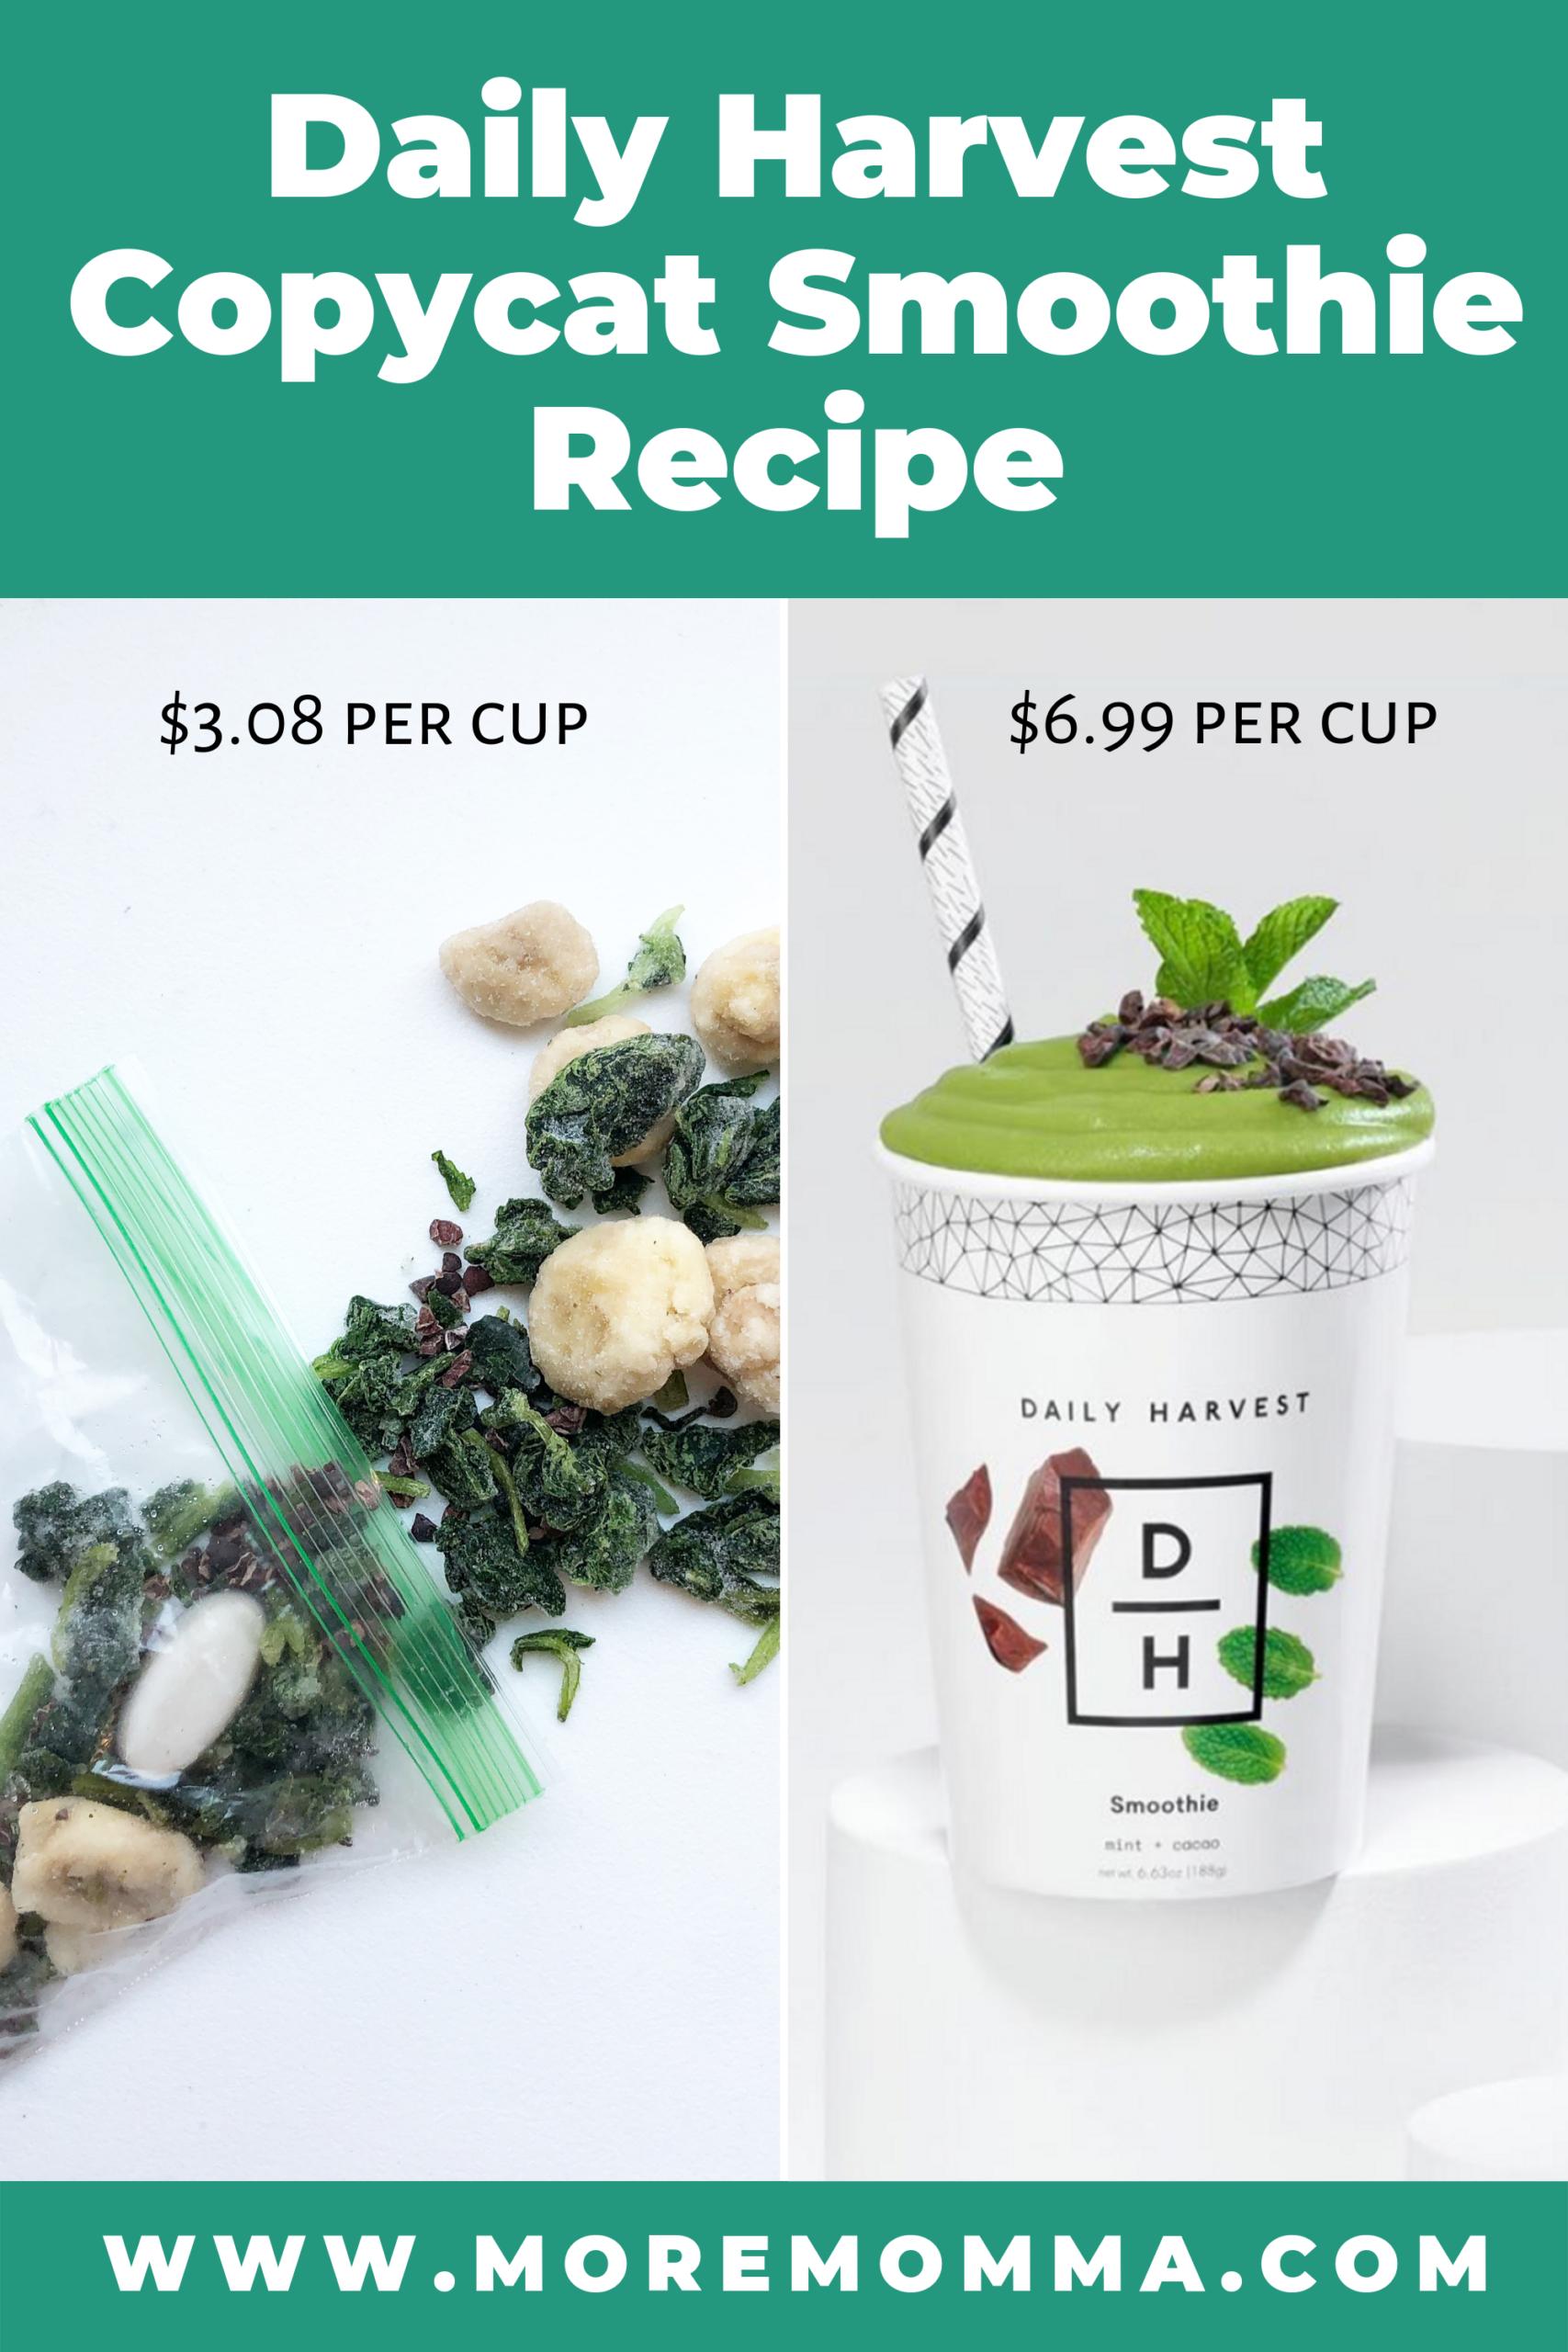 Daily Harvest Copycat Smoothie Recipe